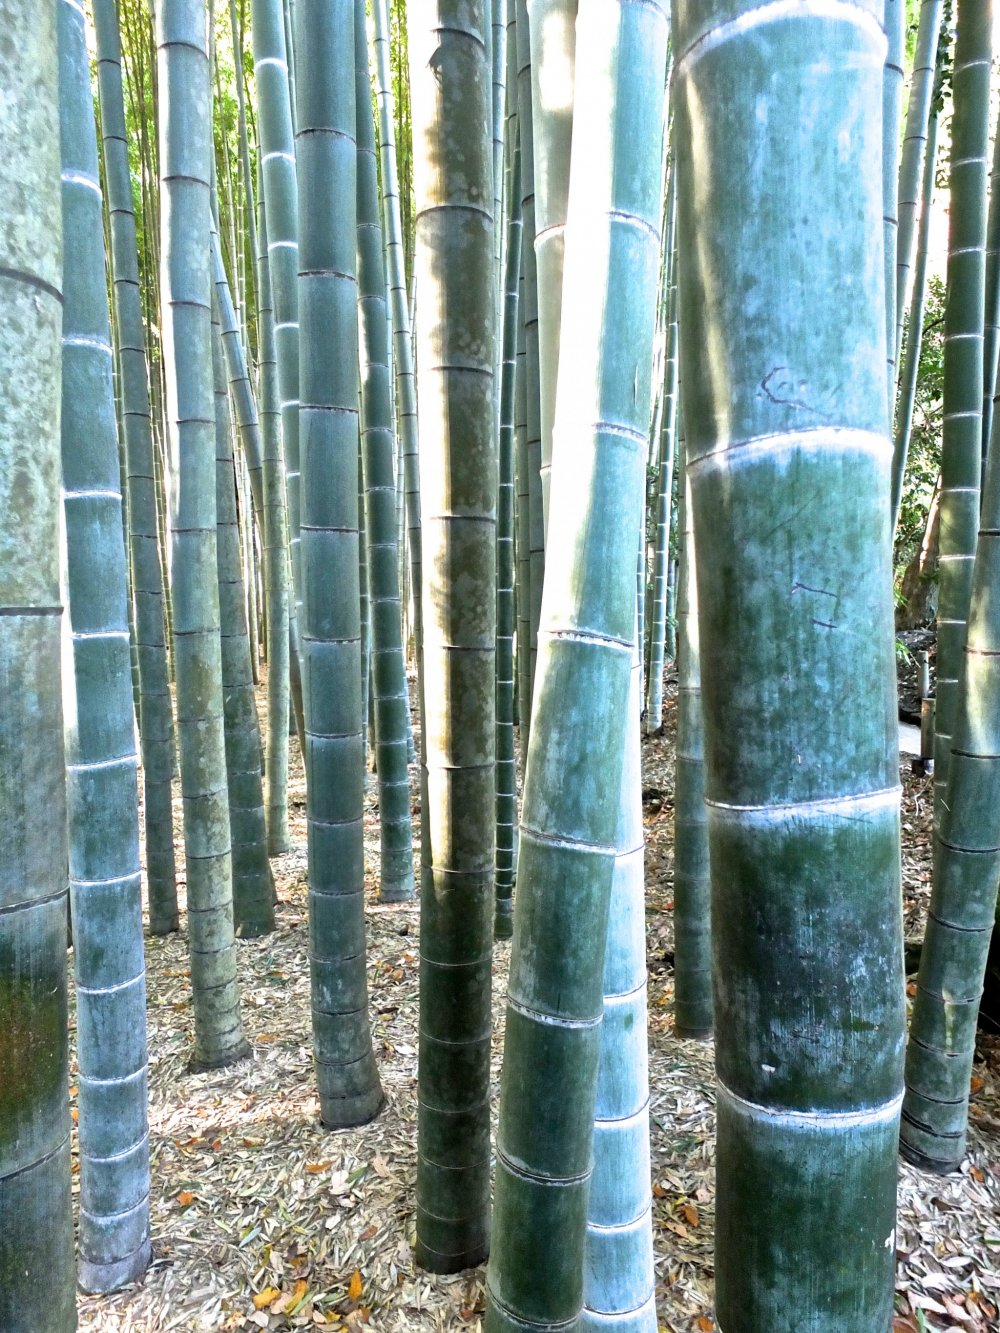 The bamboo grove at Hokokuji Temple, Kamakura